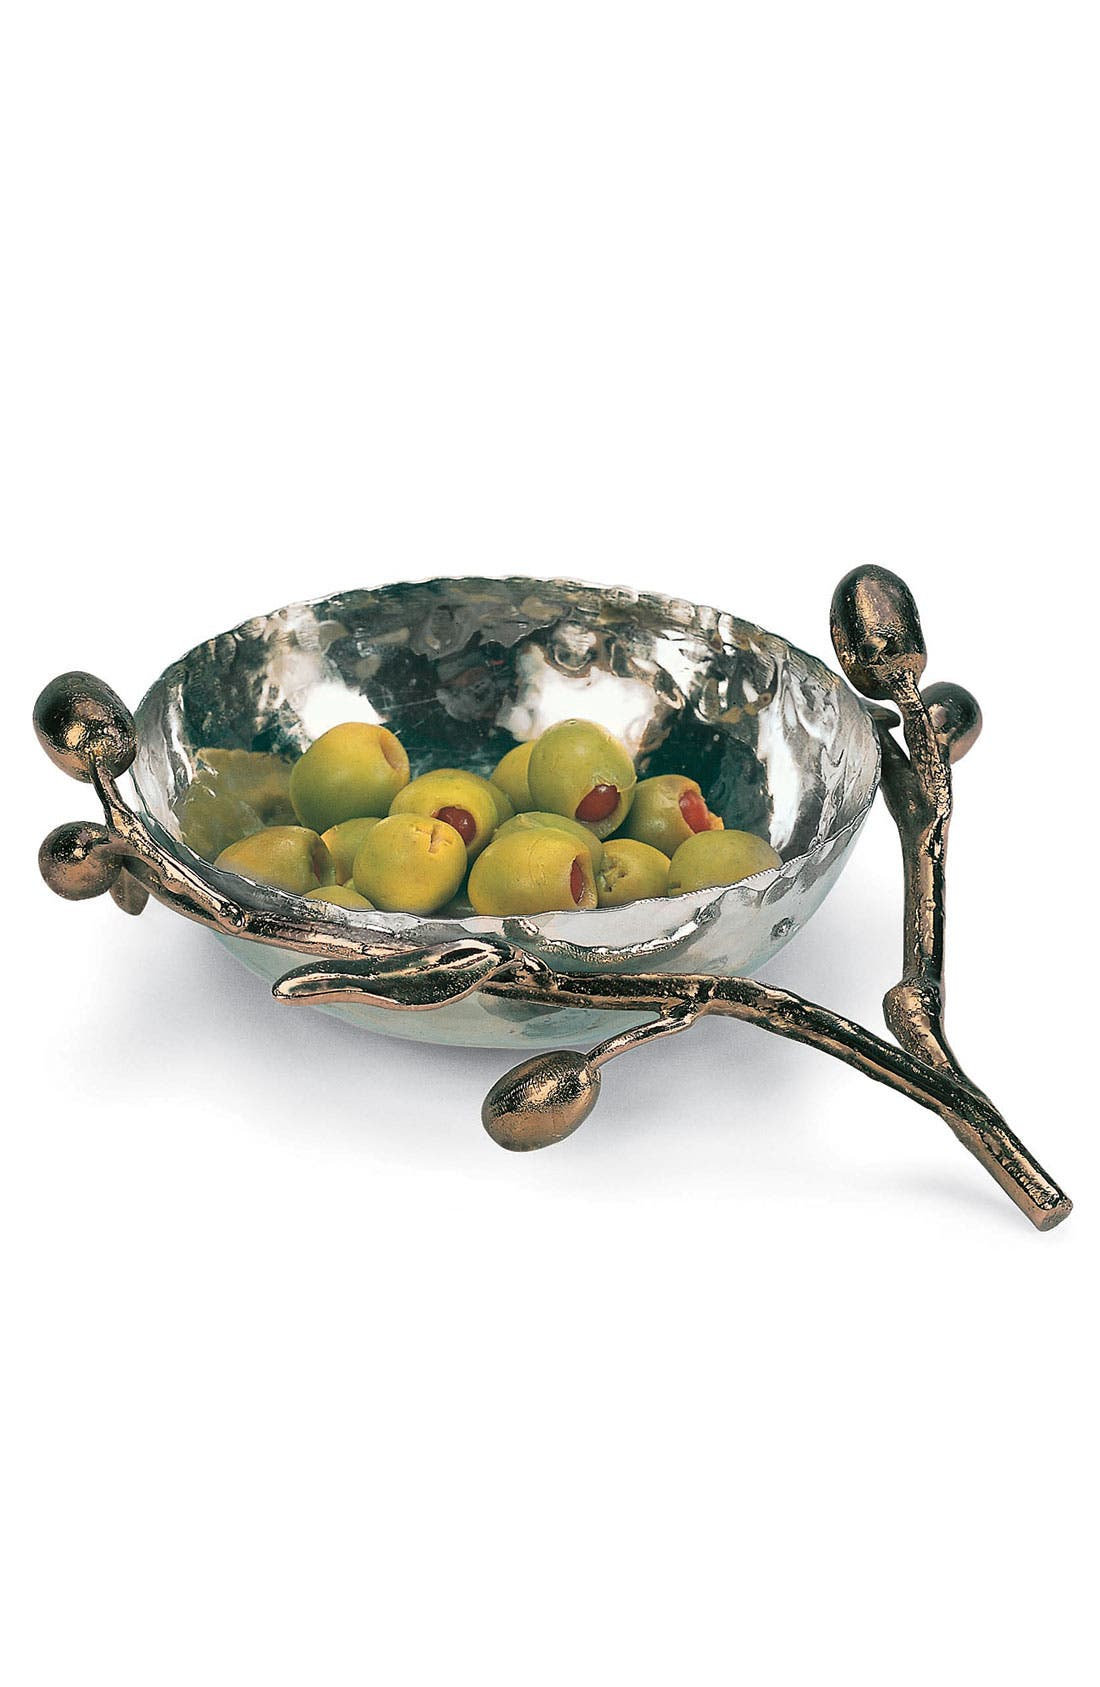 Main Image - Michael Aram 'Olive Branch' Dish